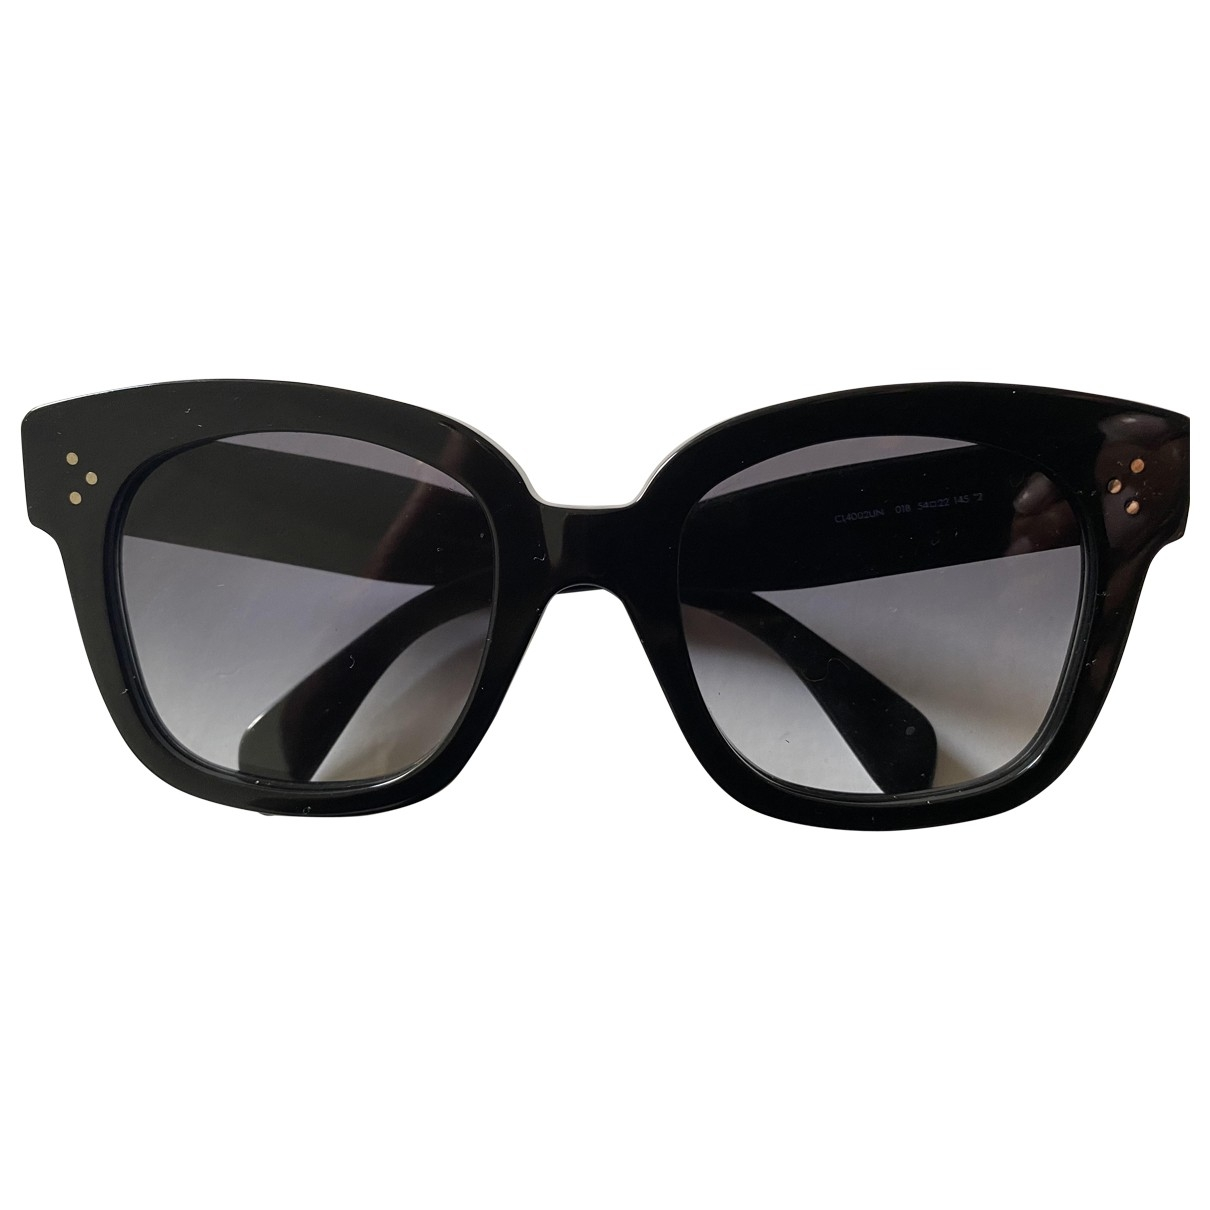 Gafas oversize New Audrey Celine